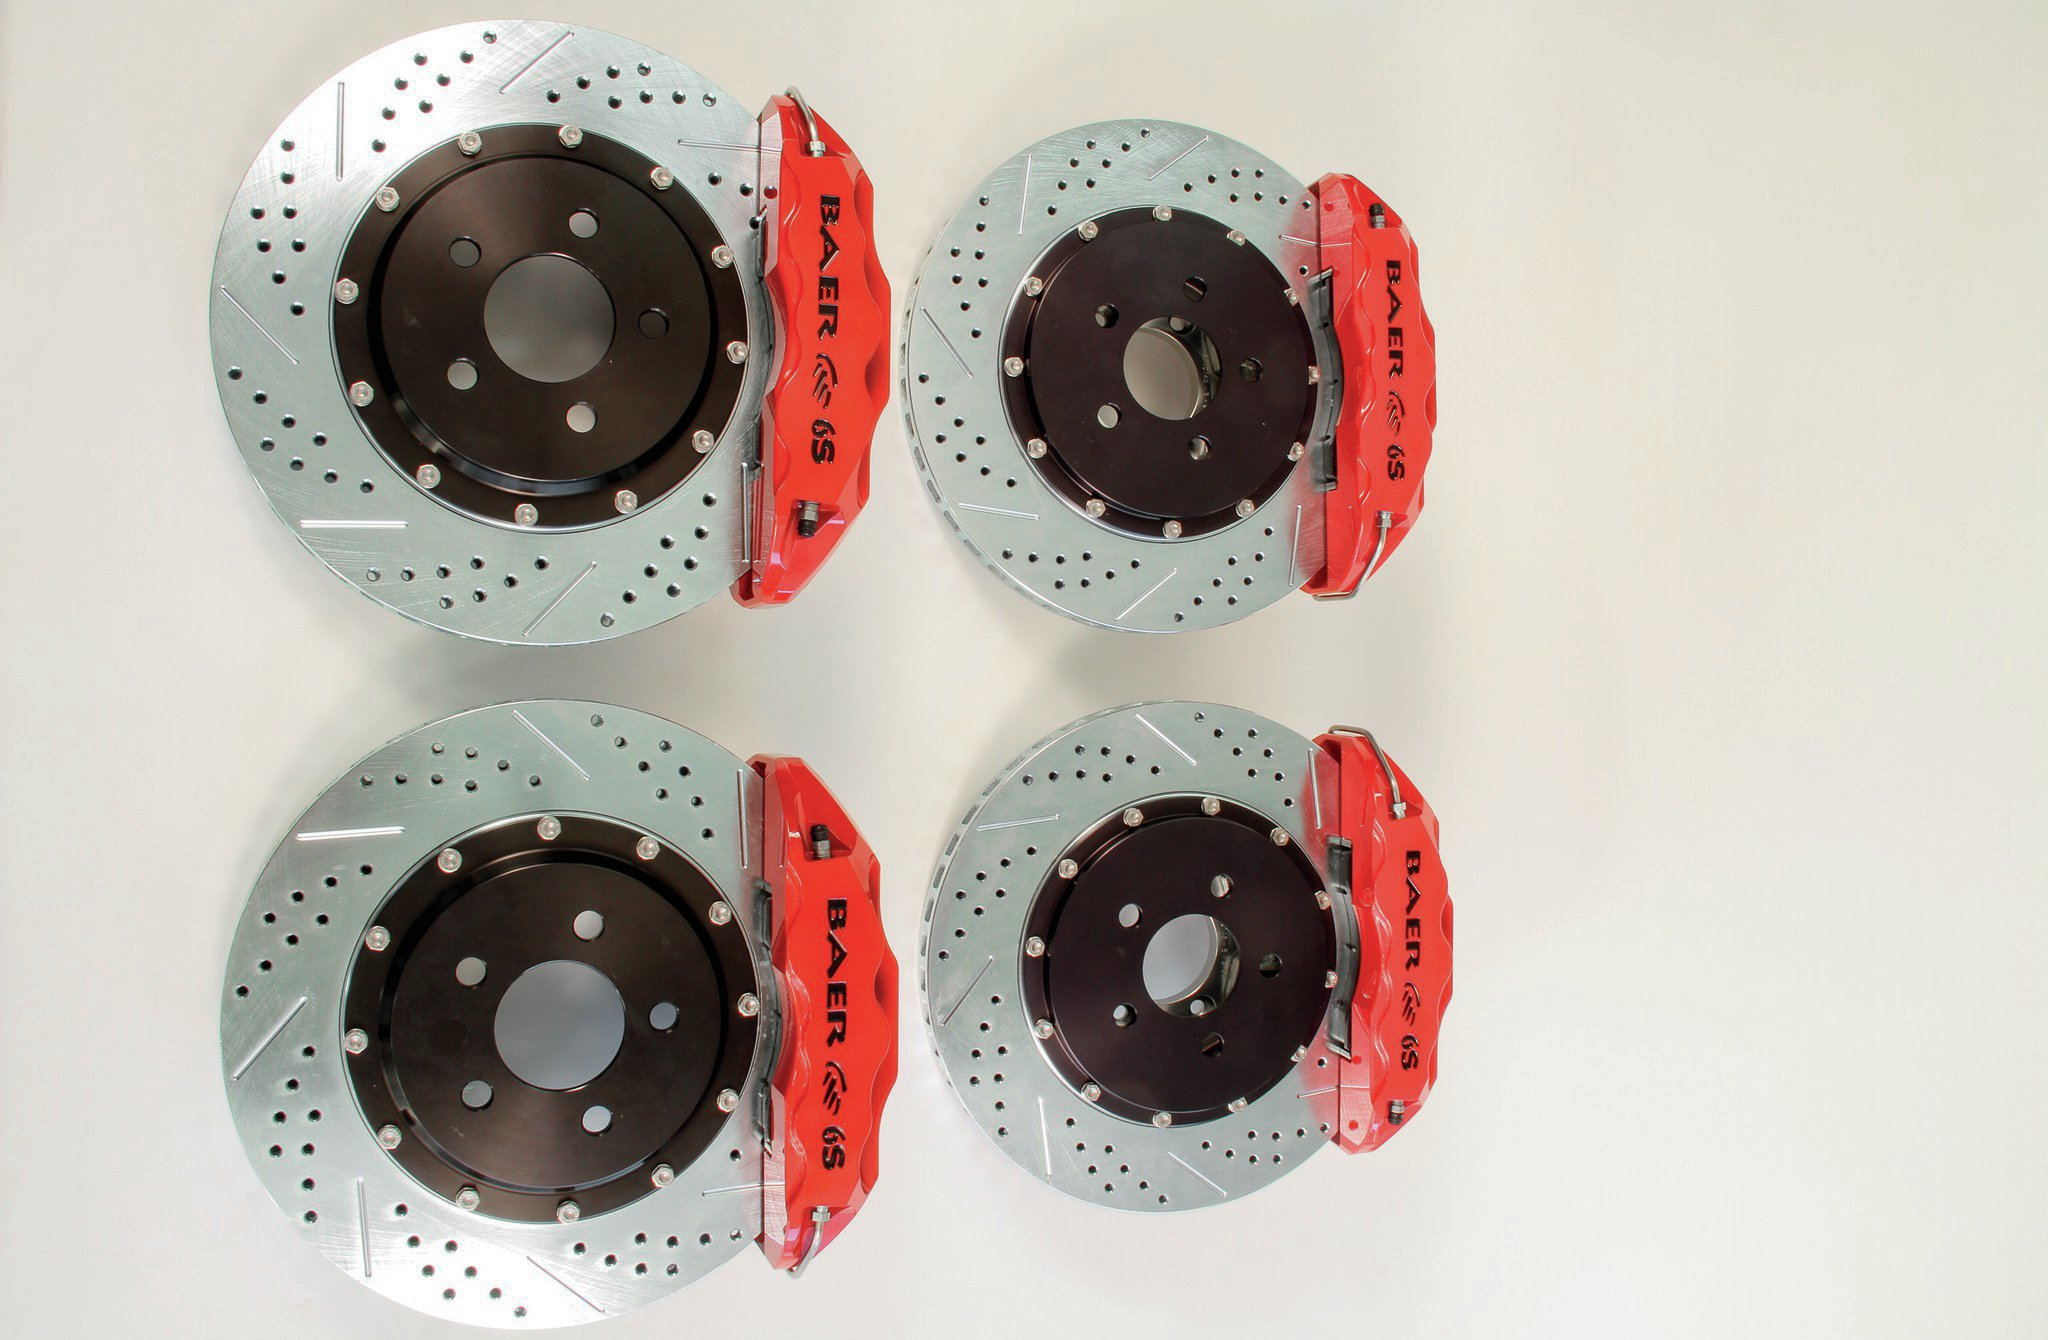 Baer Extreme 6s Brake Kit